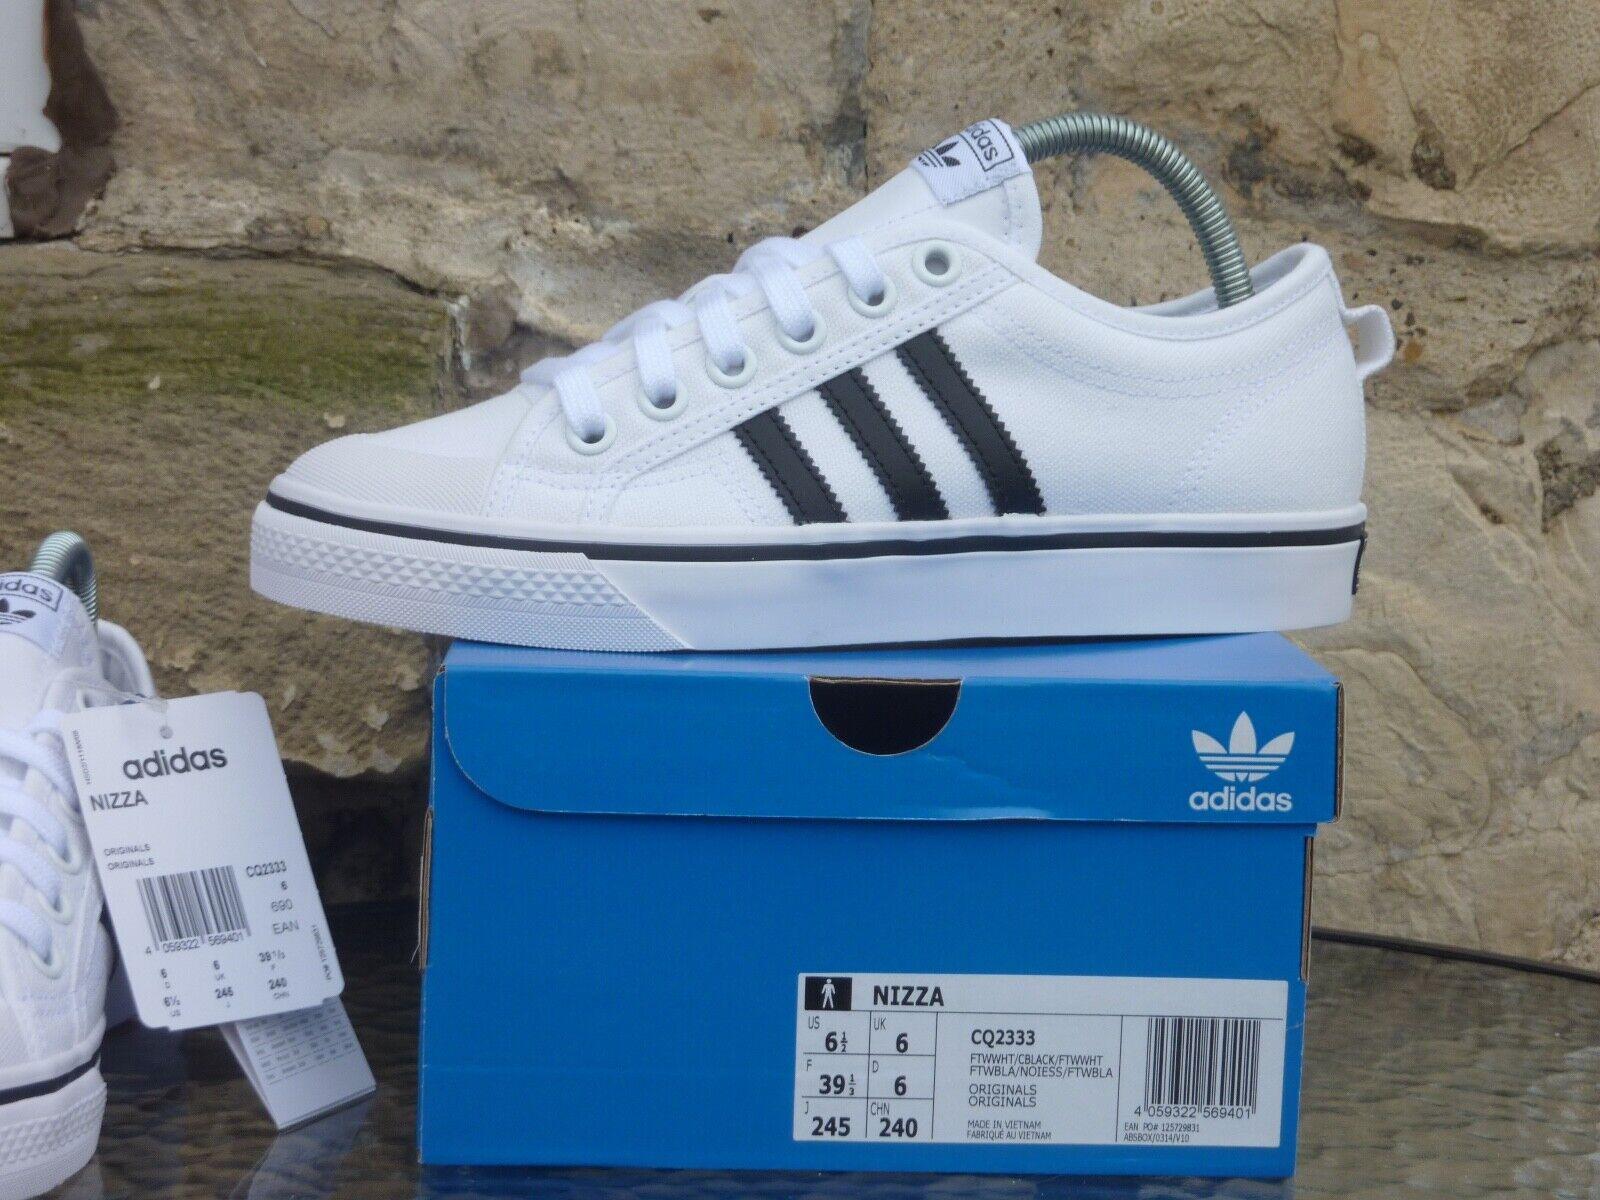 2020 Adidas Originals Nizza UK6 / US6.5 White Black BNIB OG New DS Pumps